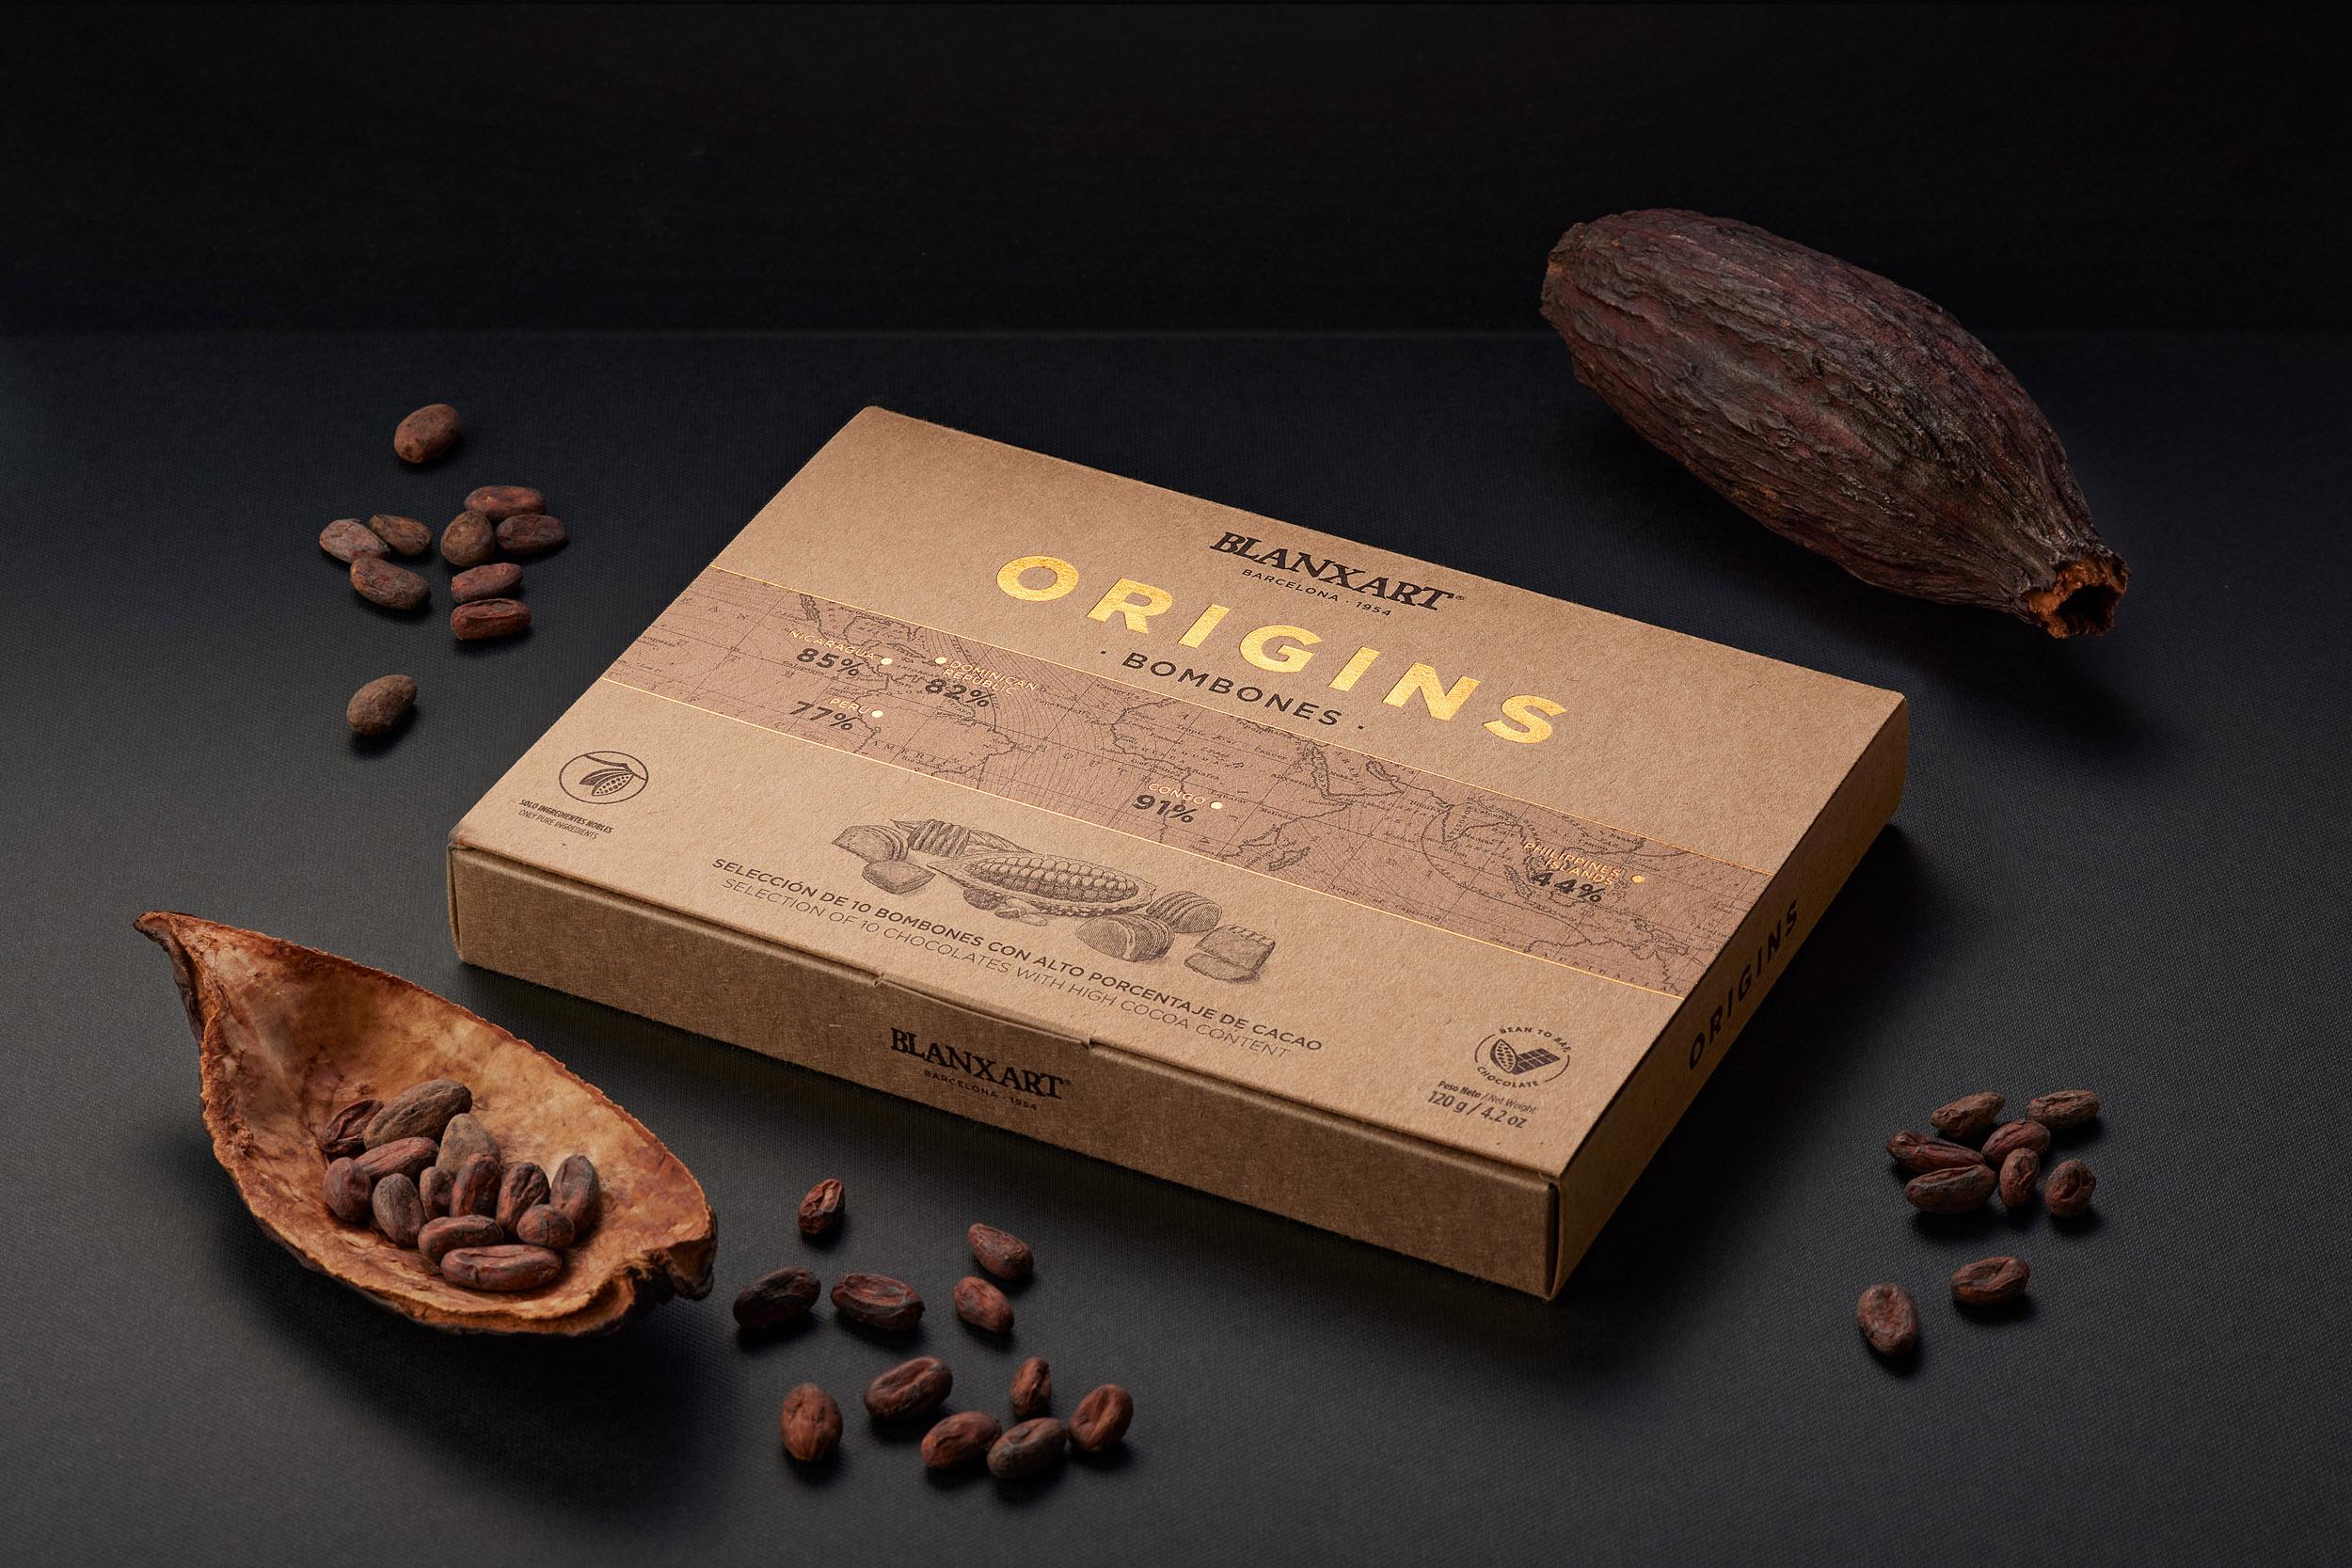 Blanxart Luxury Chocolates New Range Designed by Bulldog Studio